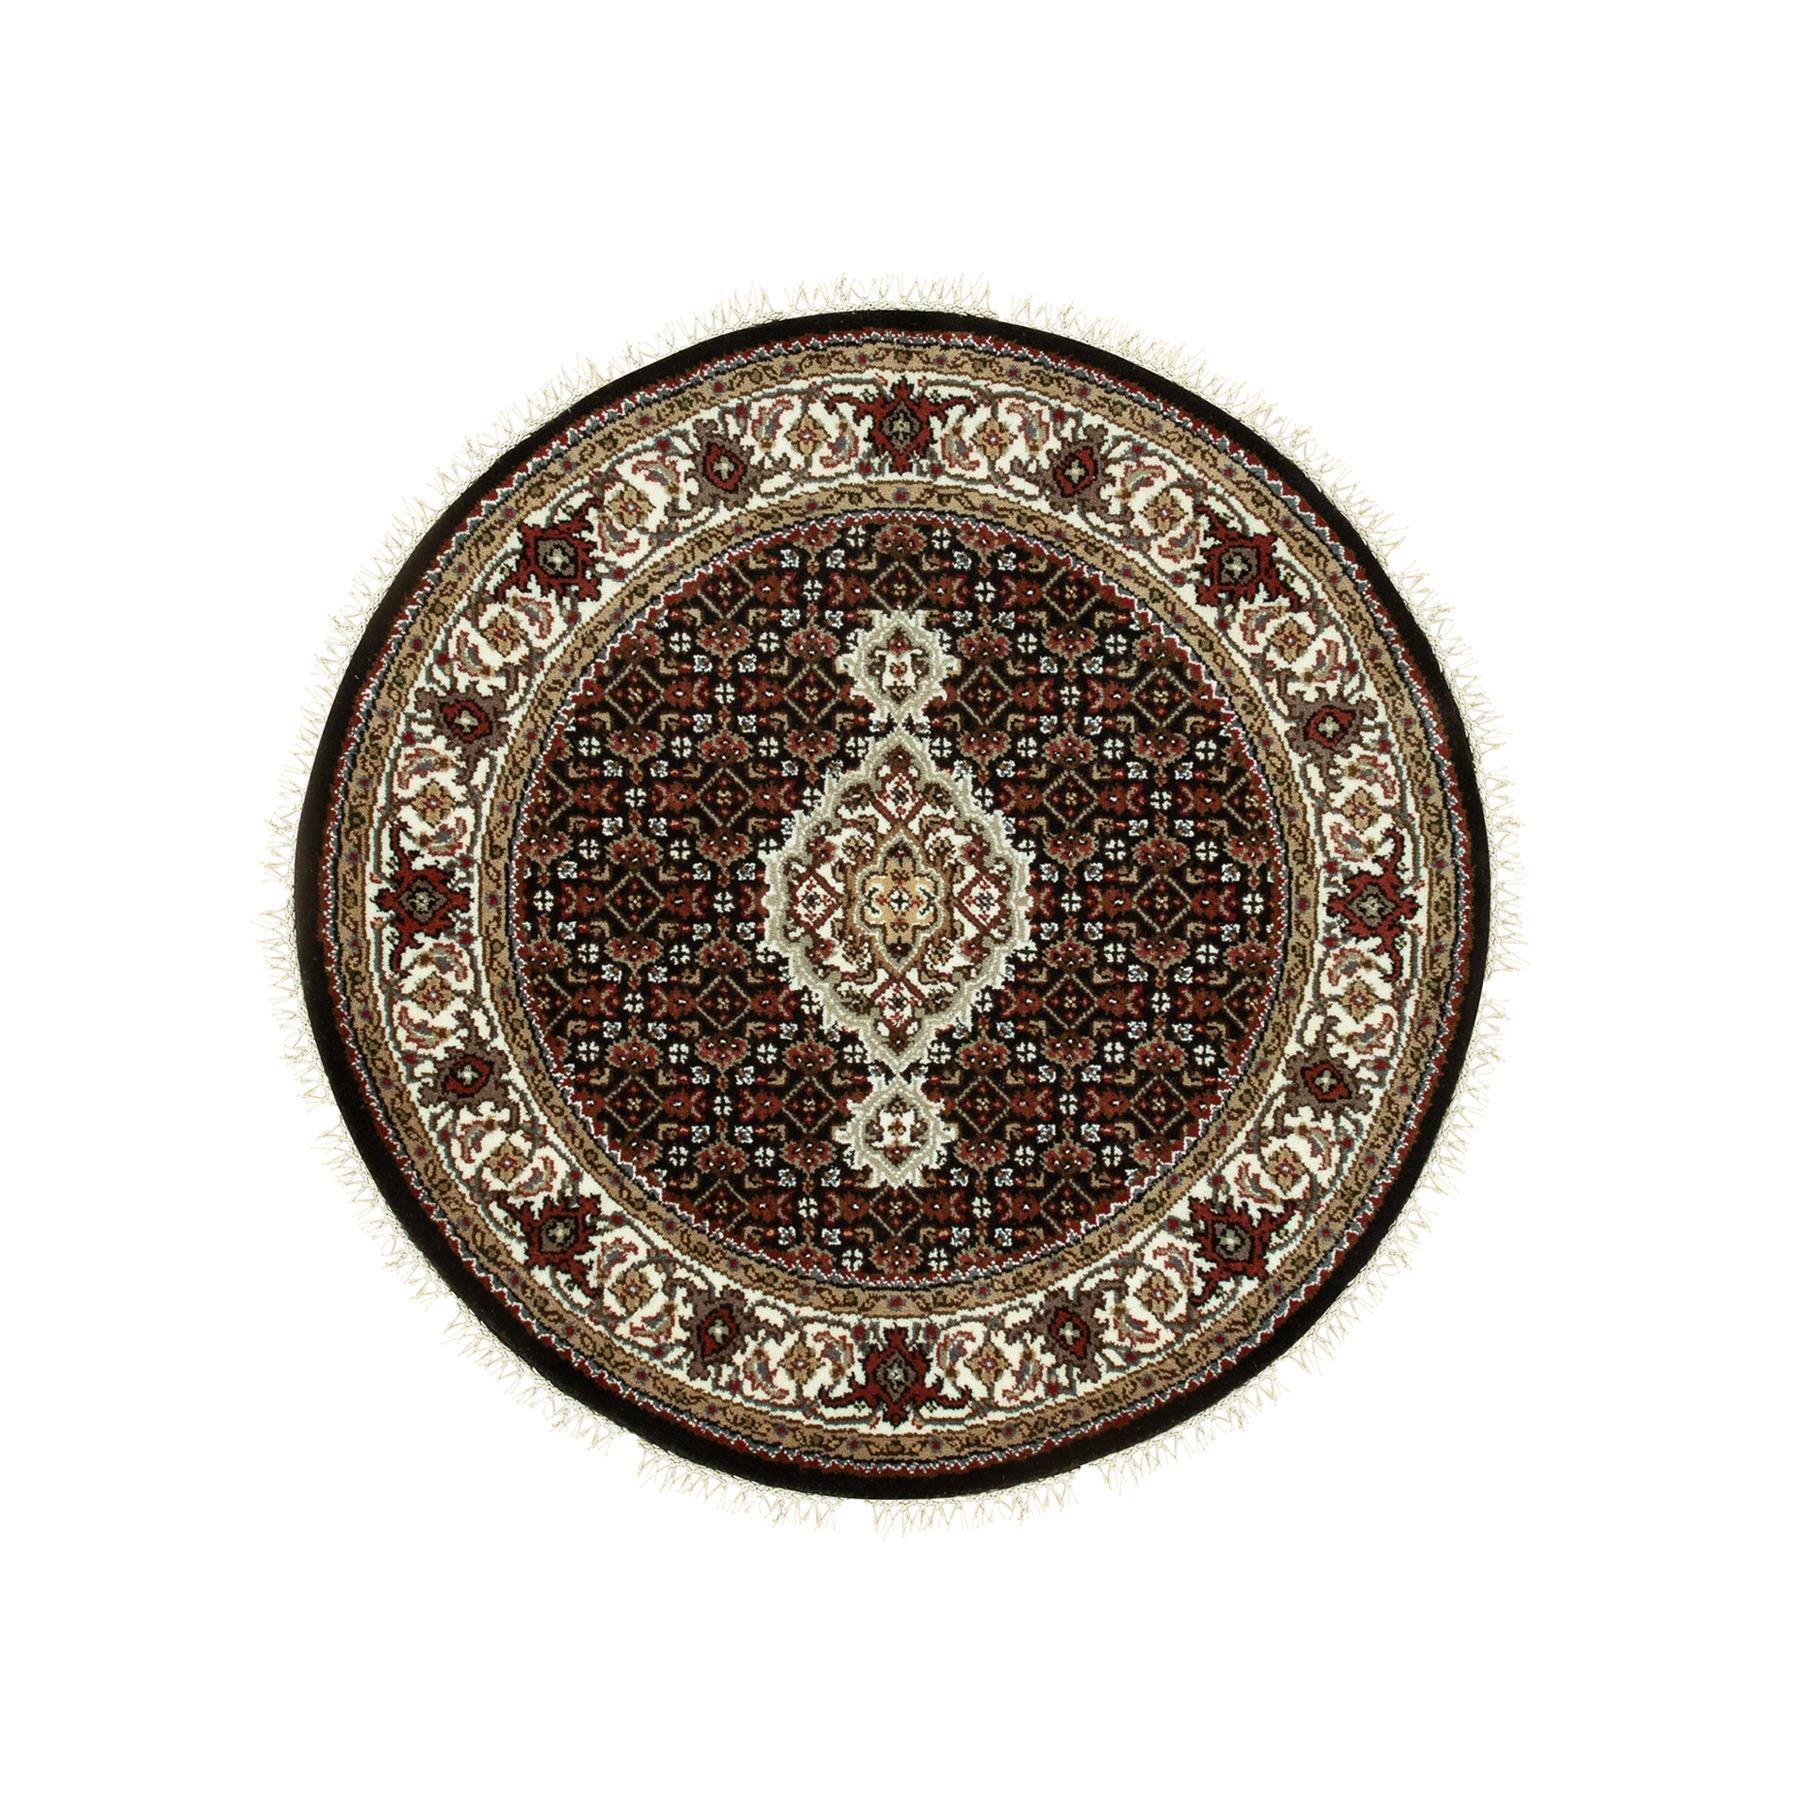 3'x3' Hand Knotted Wool And Silk Black Fish Design Tabriz Mahi Oriental Round Rug